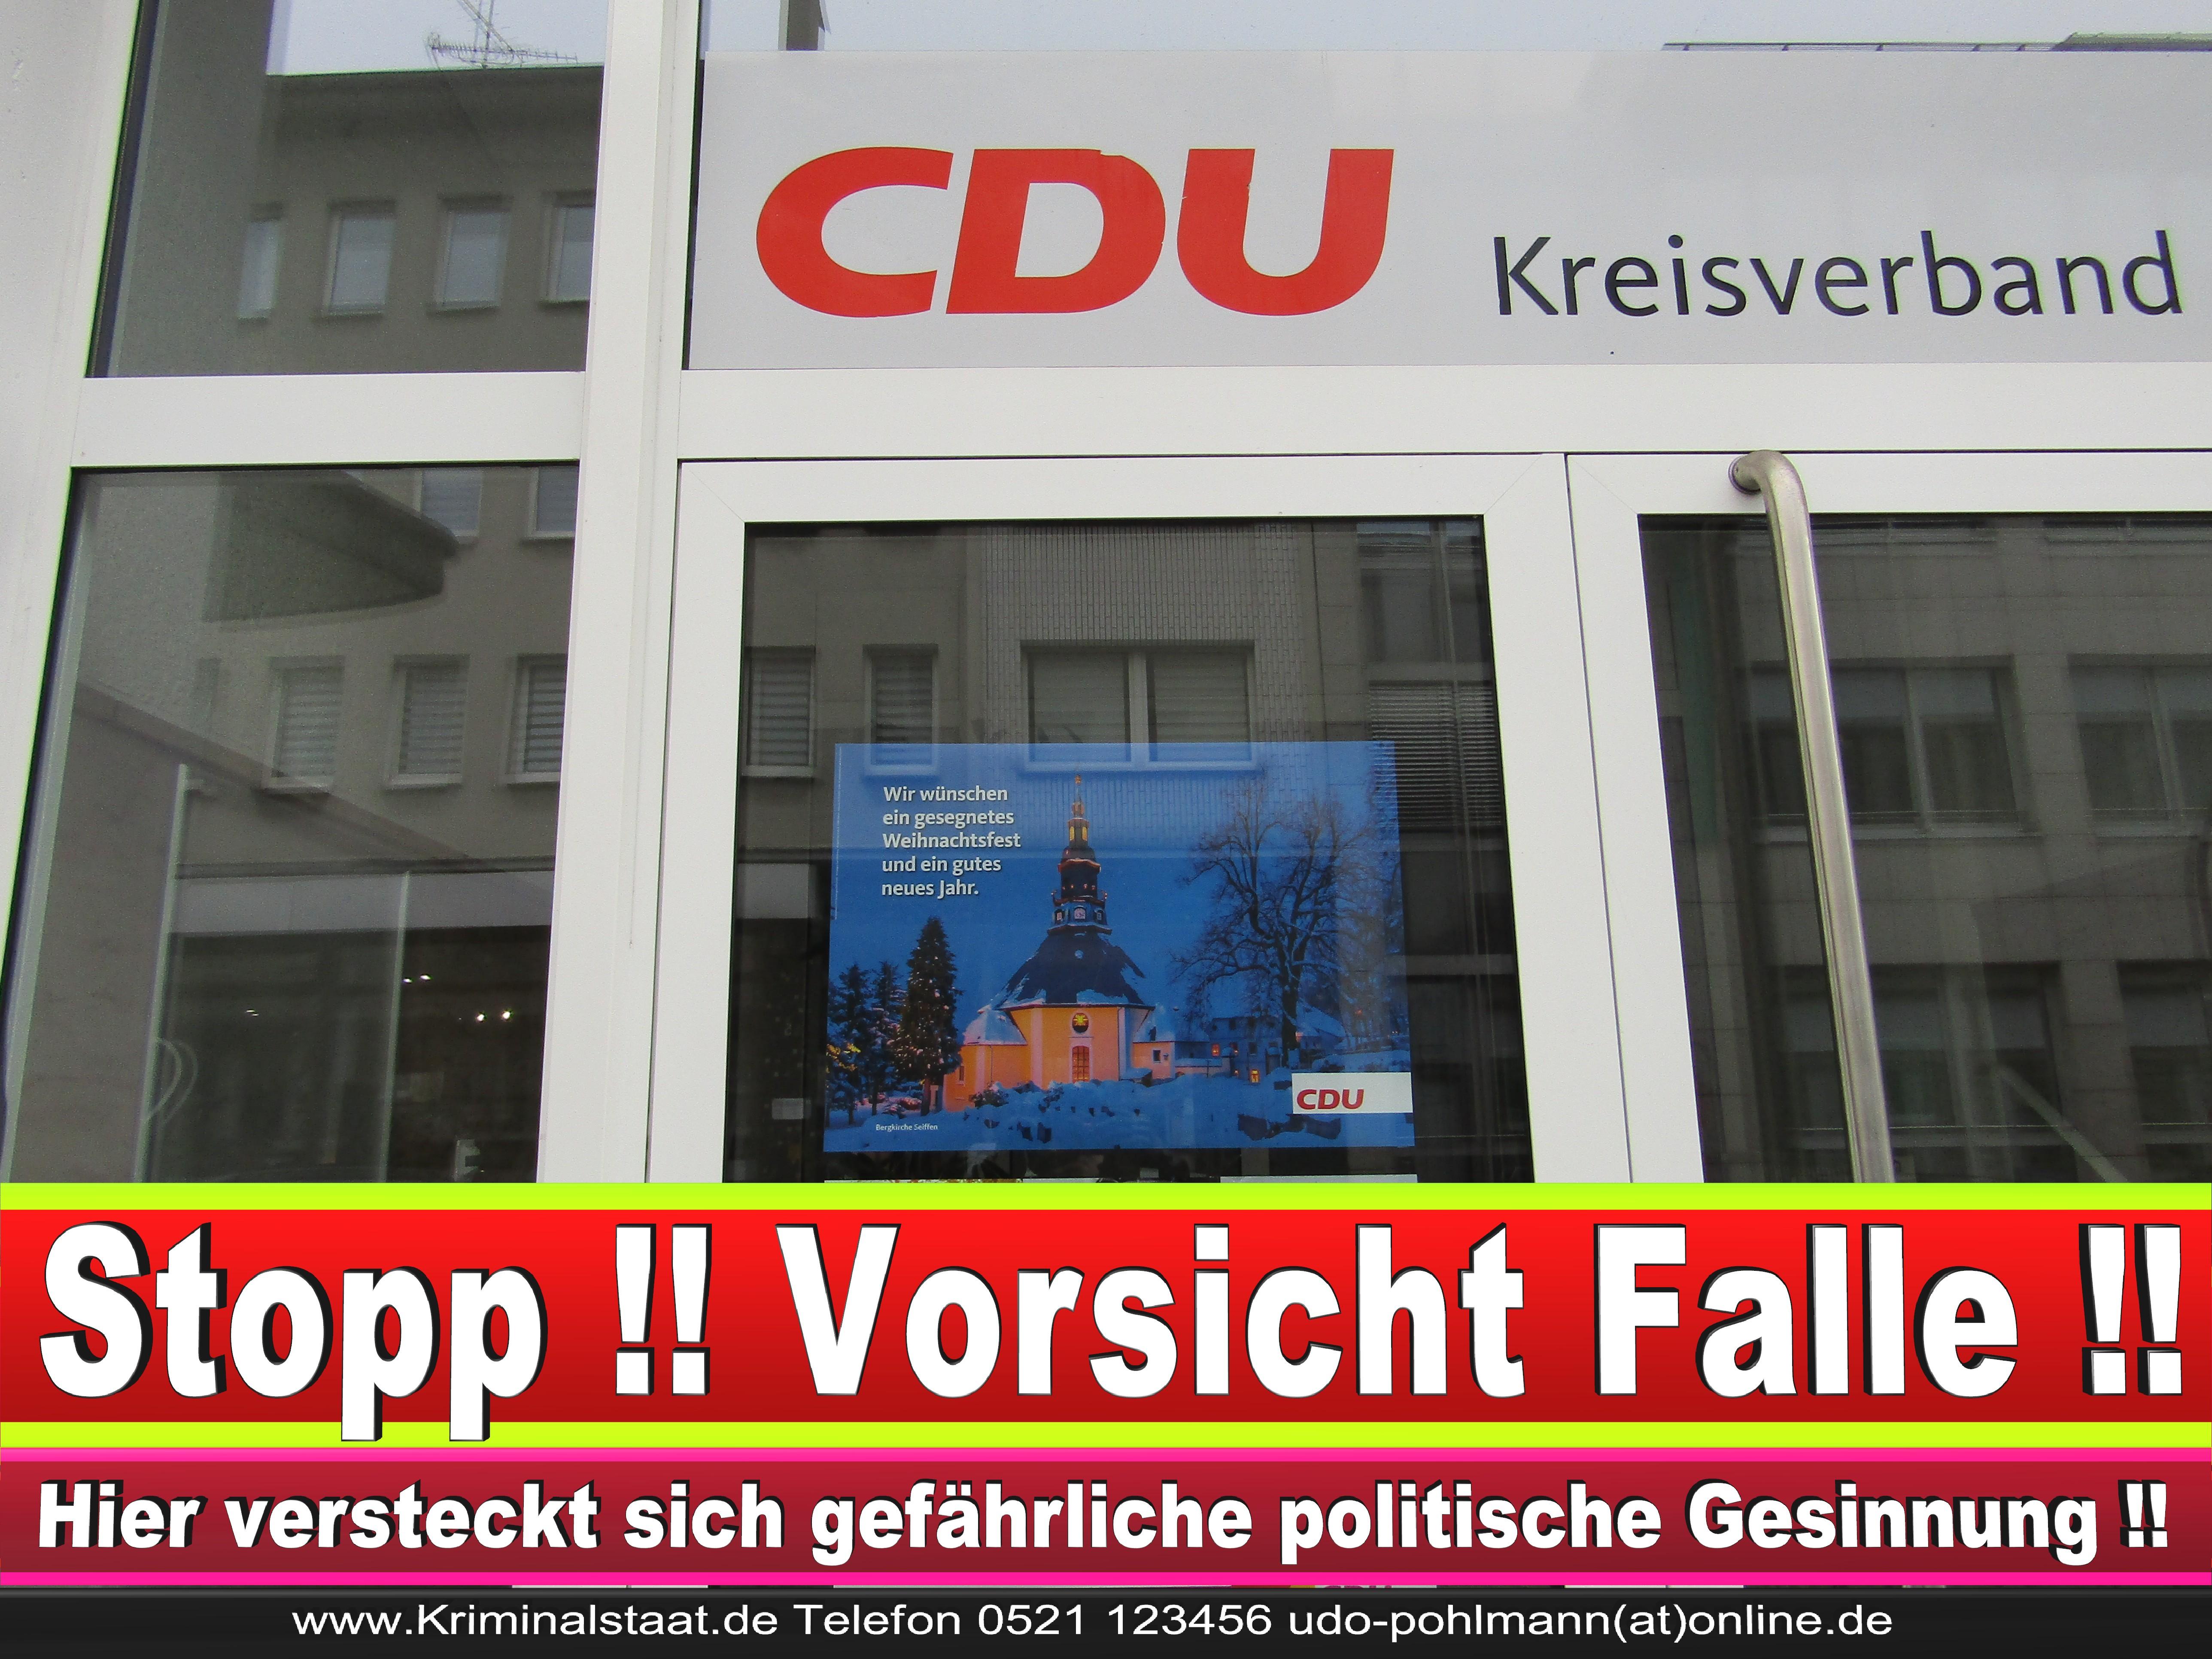 CDU DORTMUND KREISVERBAND BüRGERBüRO CDU FRAKTION ORTSVERBAND CDU NRW GESCHäFTSSTELLE ADRESSE RATSMITGLIEDER CDU (2) 1